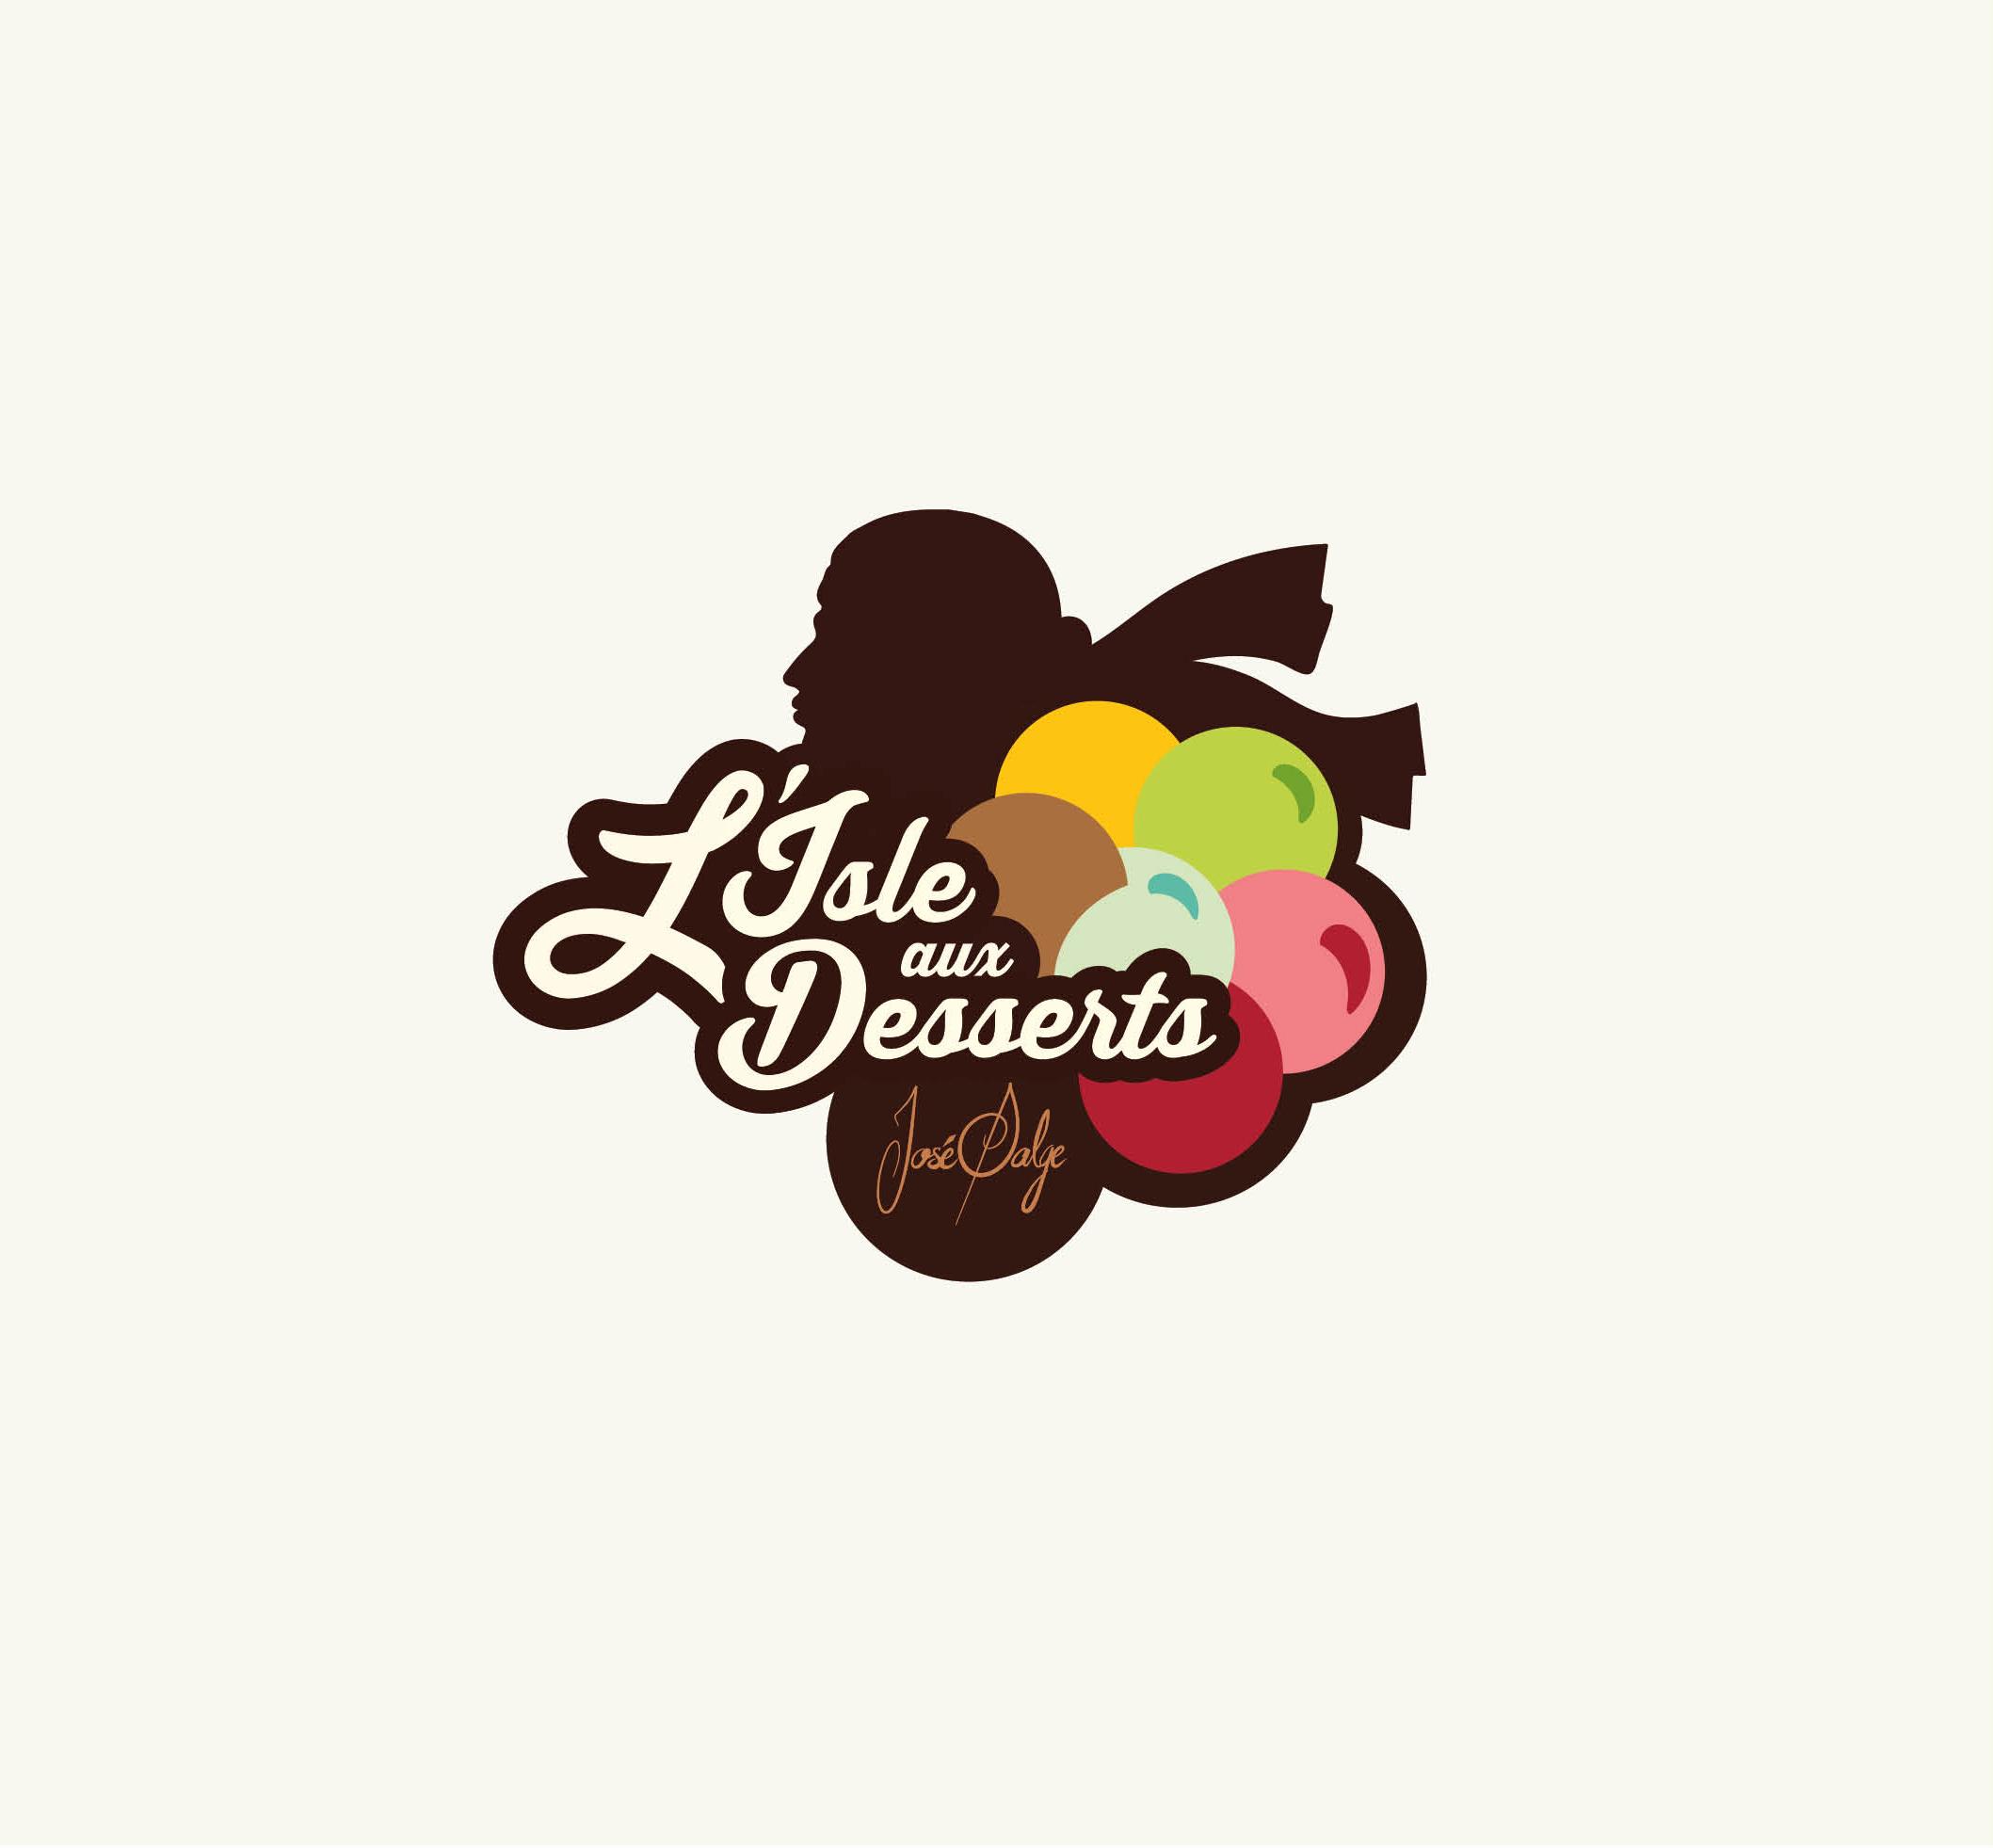 logo l'Isle aux Desserts